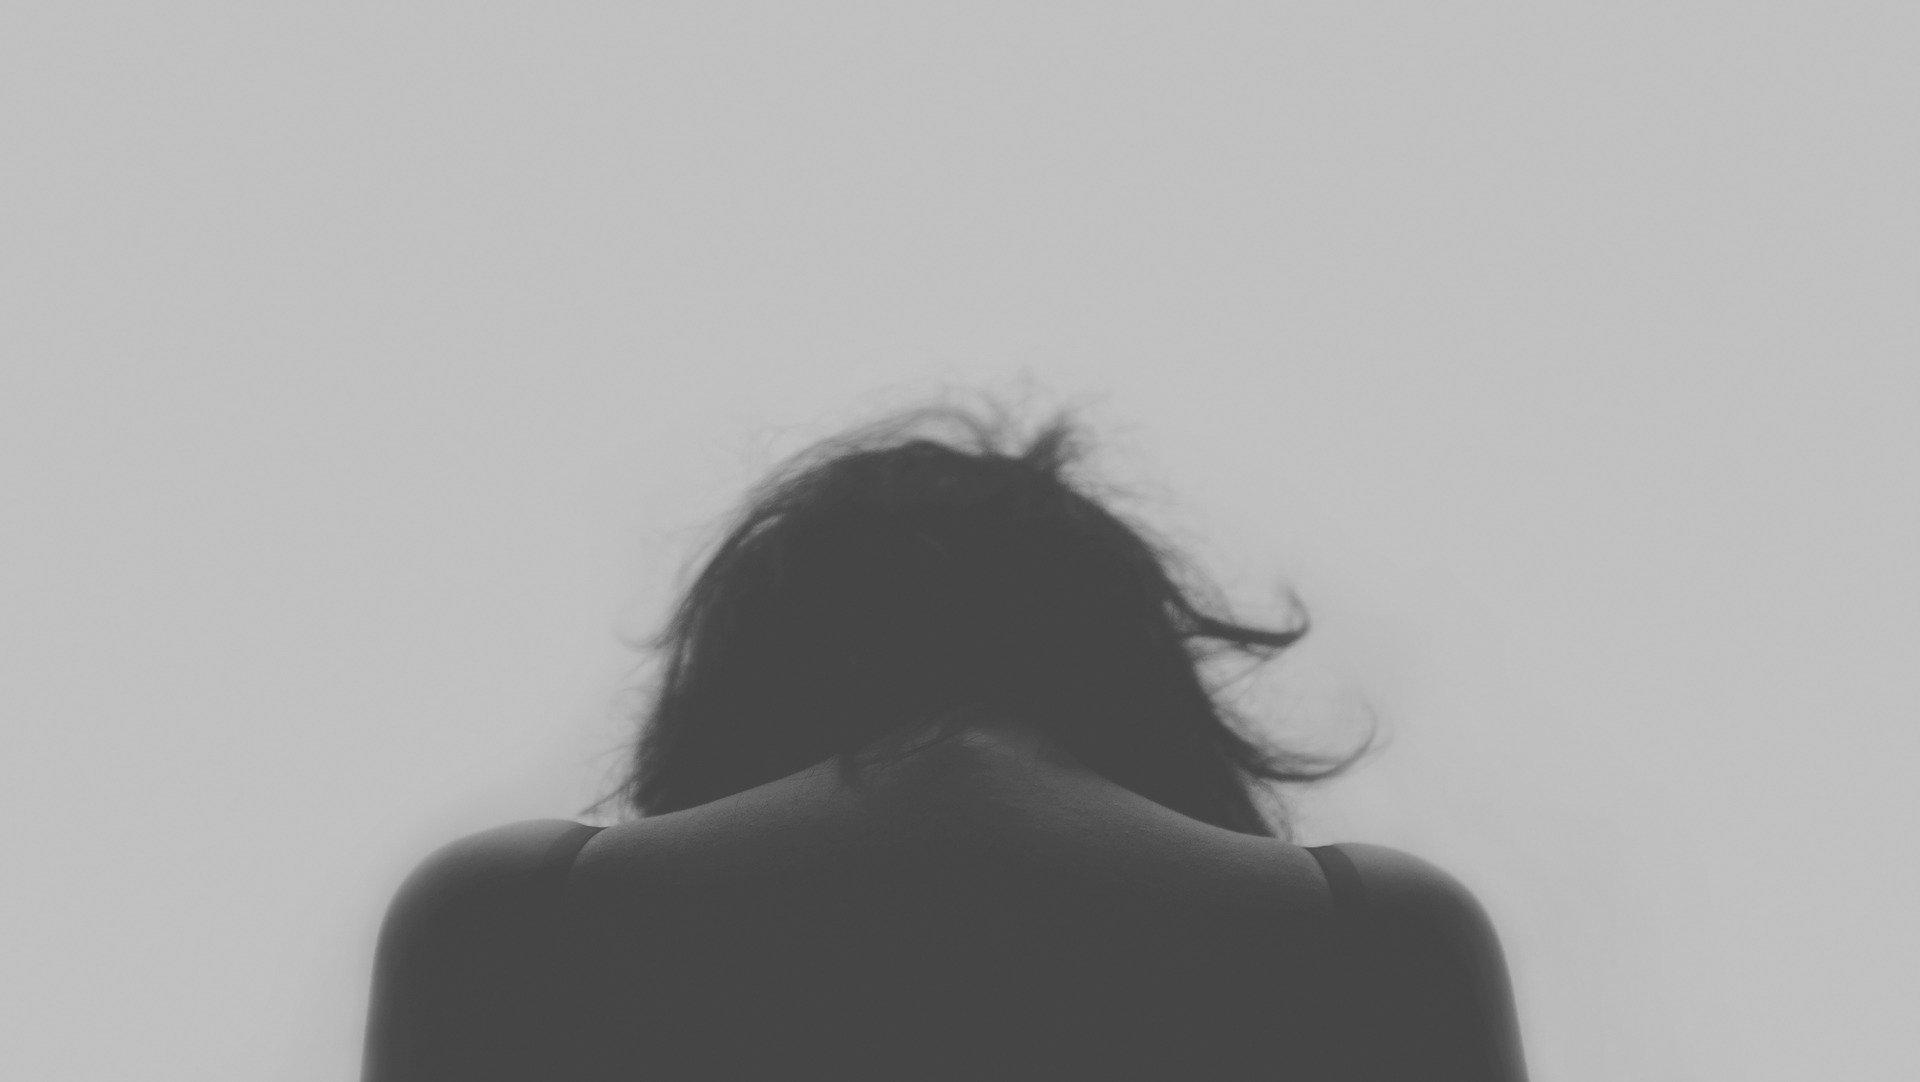 Profissionais de Enfermagem saúde mental